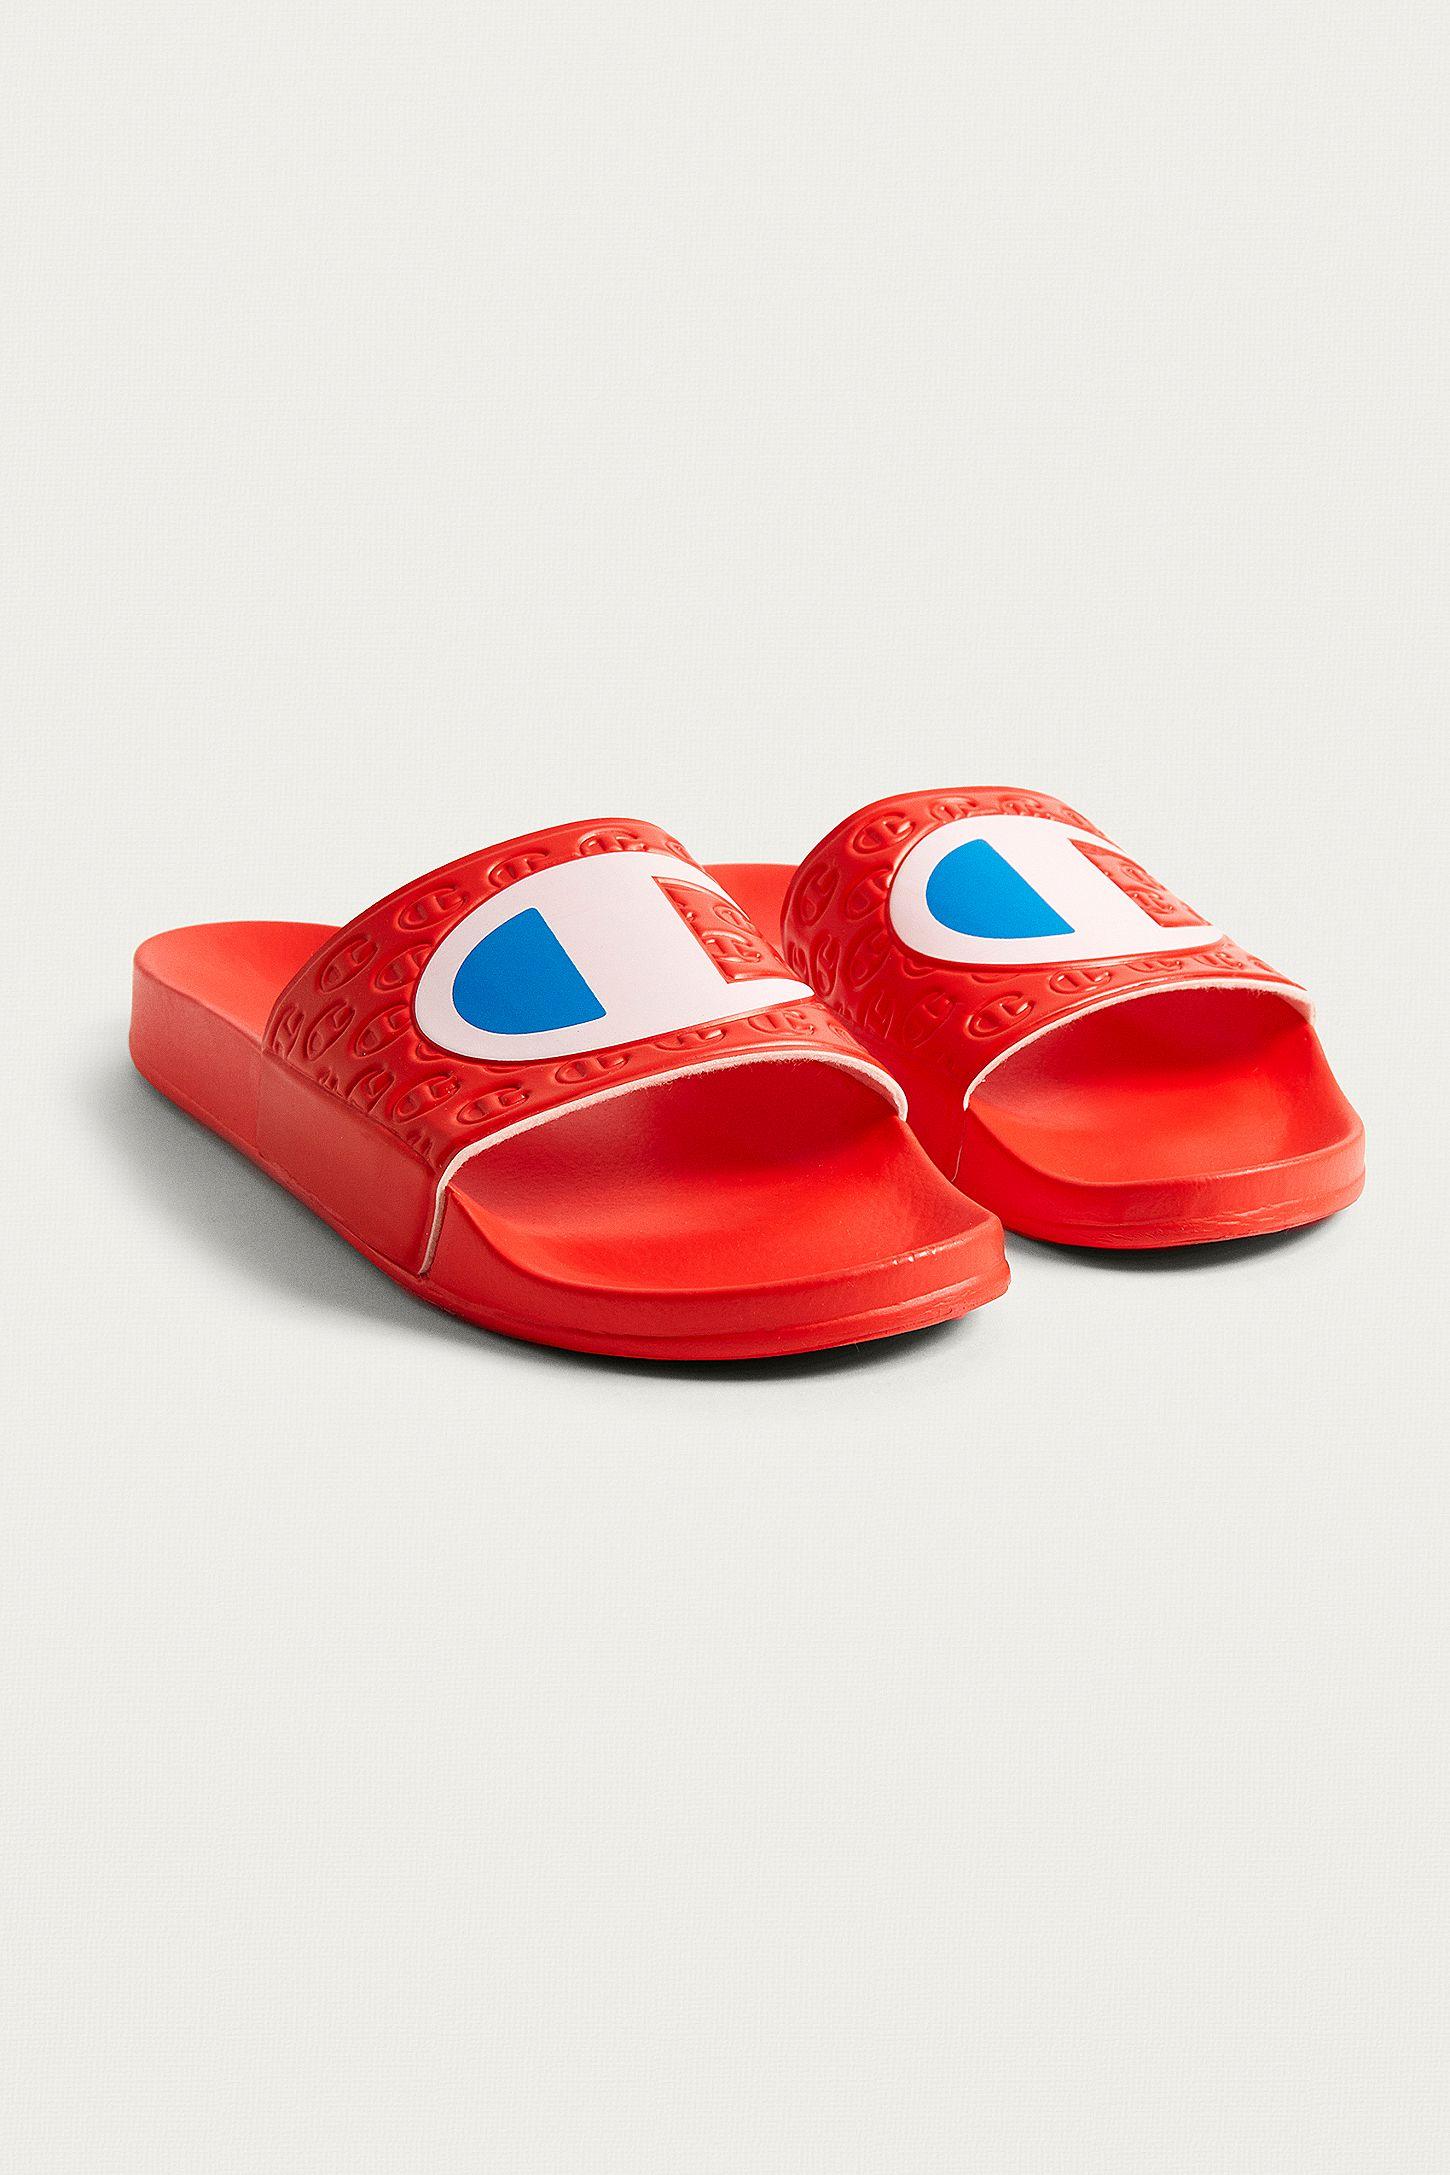 5269b5e9510427 Champion Red Logo Pool Sliders